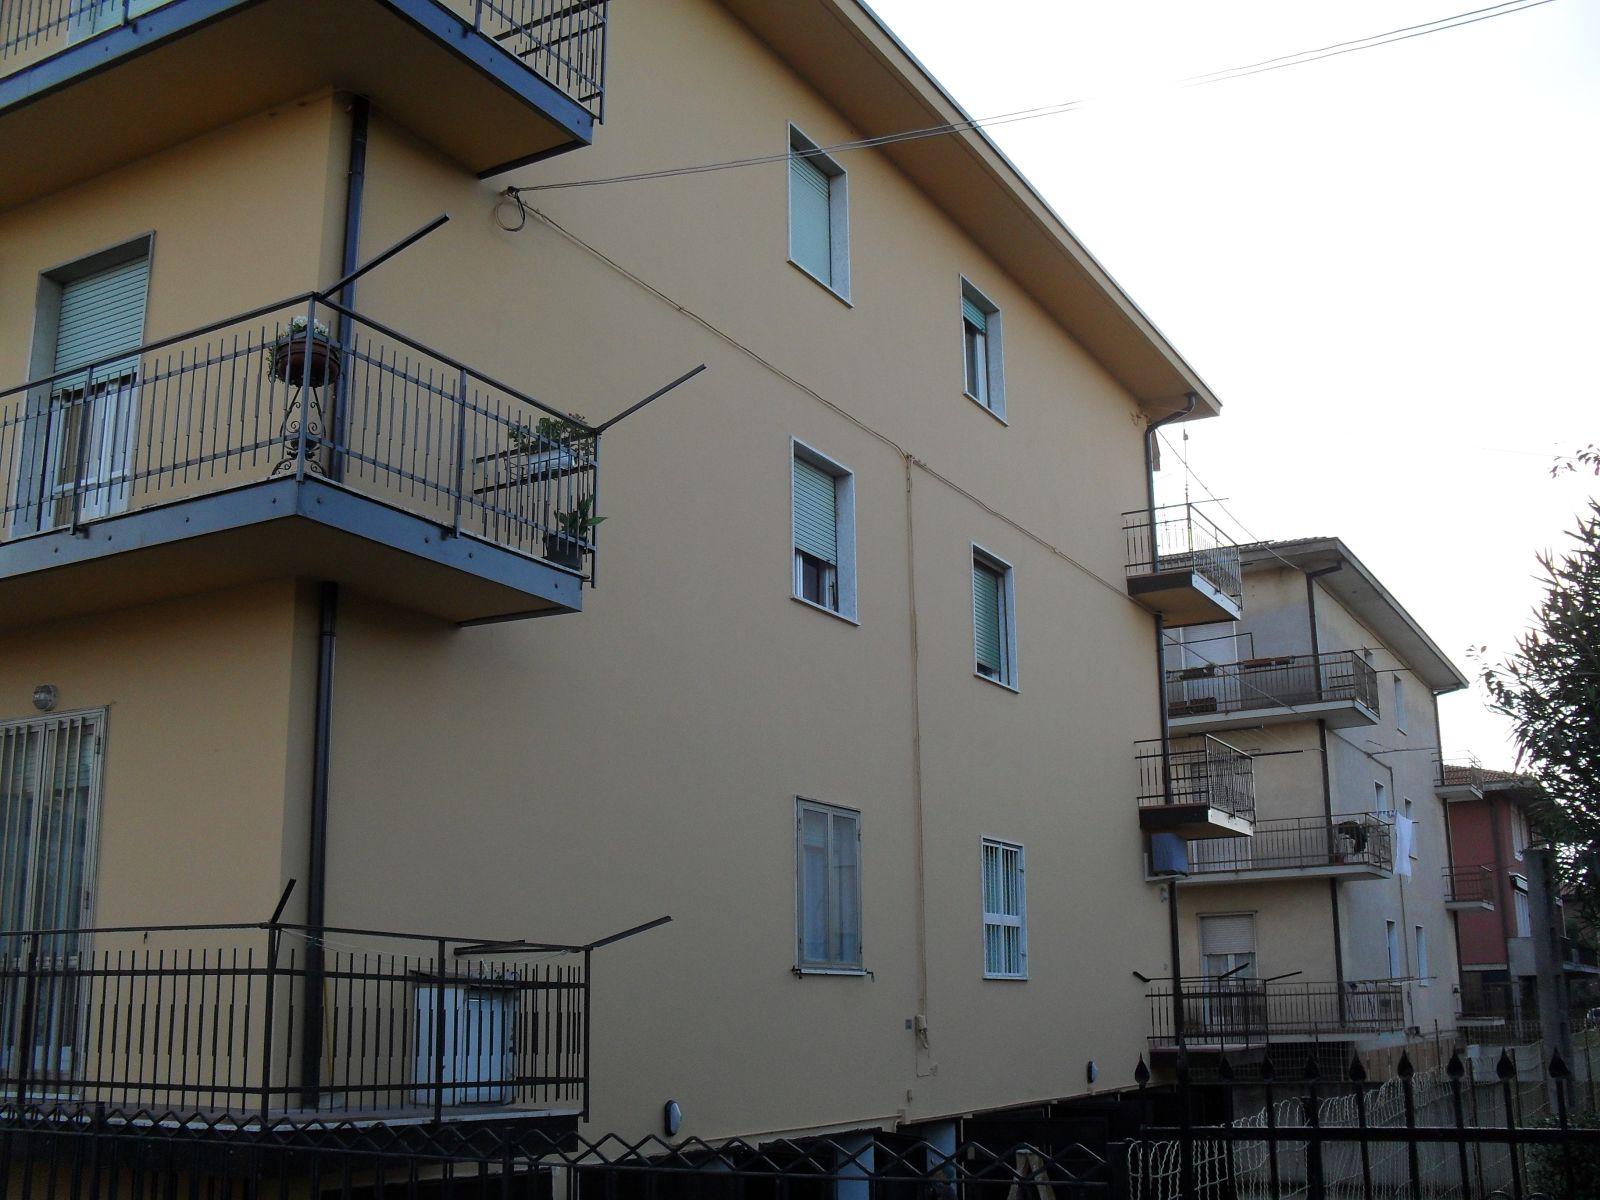 Tinteggiatura Esterna Condominio Verona Imbianchino